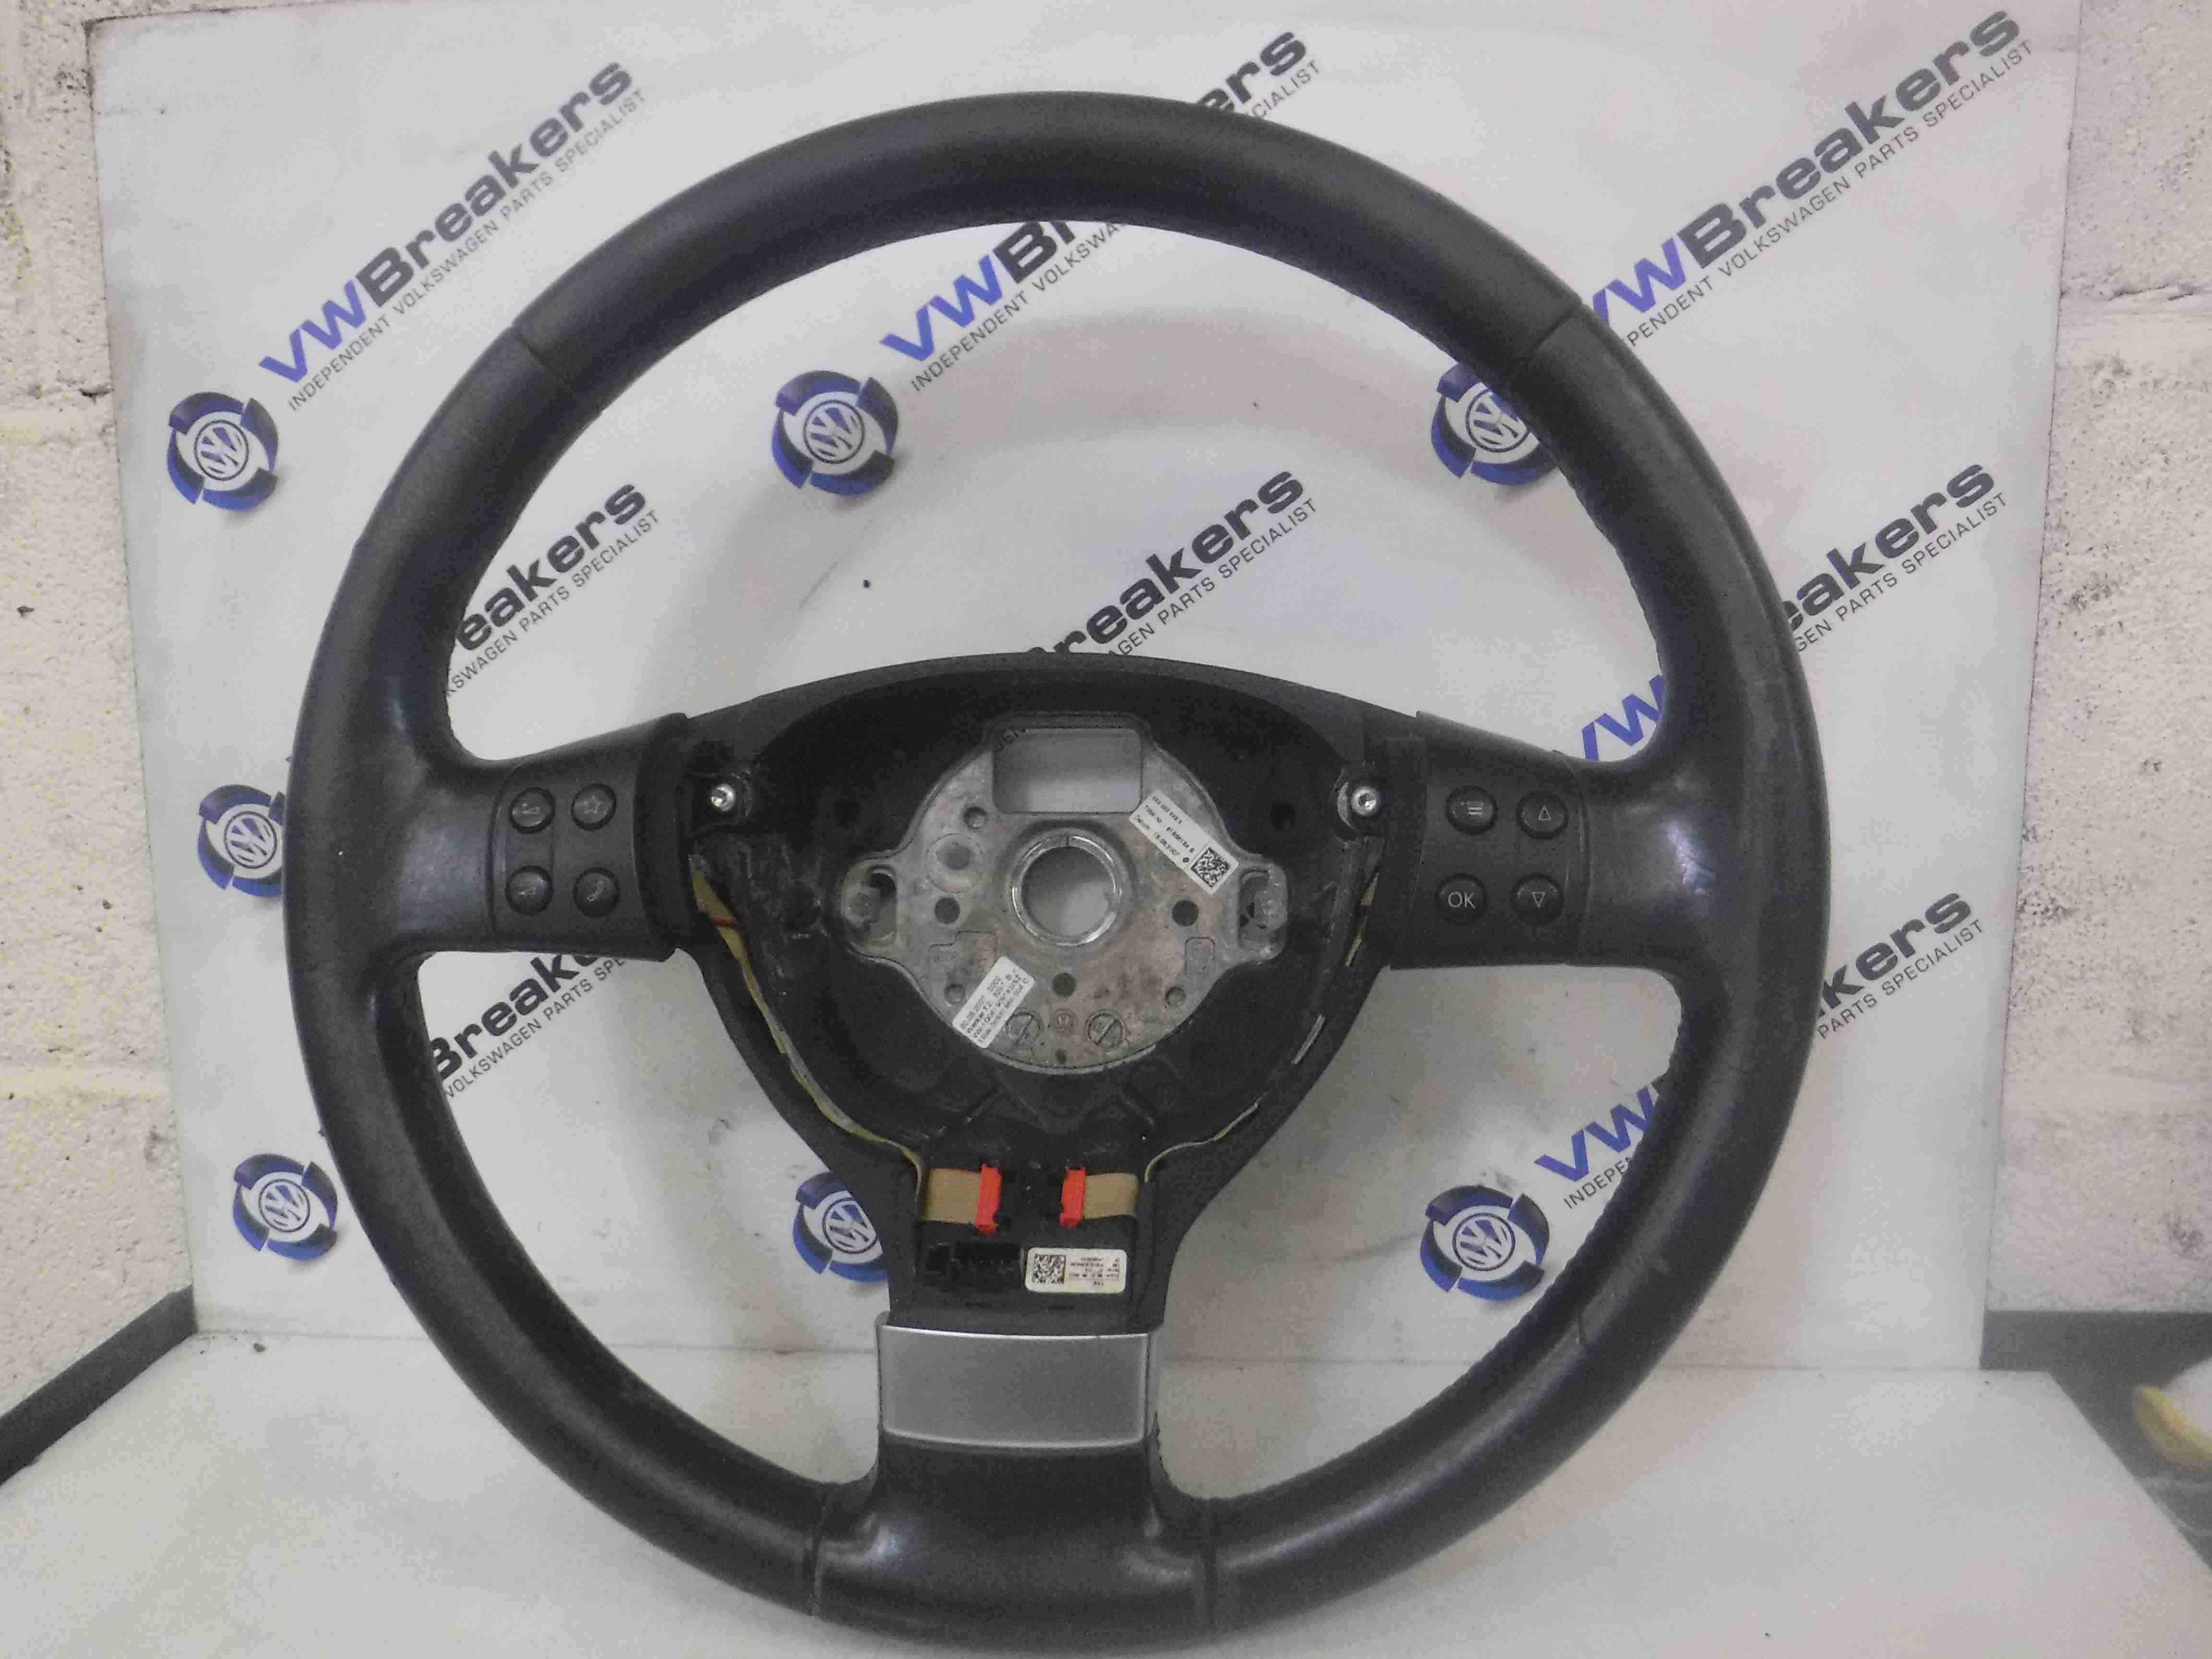 Volkswagen Golf MK5 2003-2009 Steering Wheel Multifunction 1K0959537j